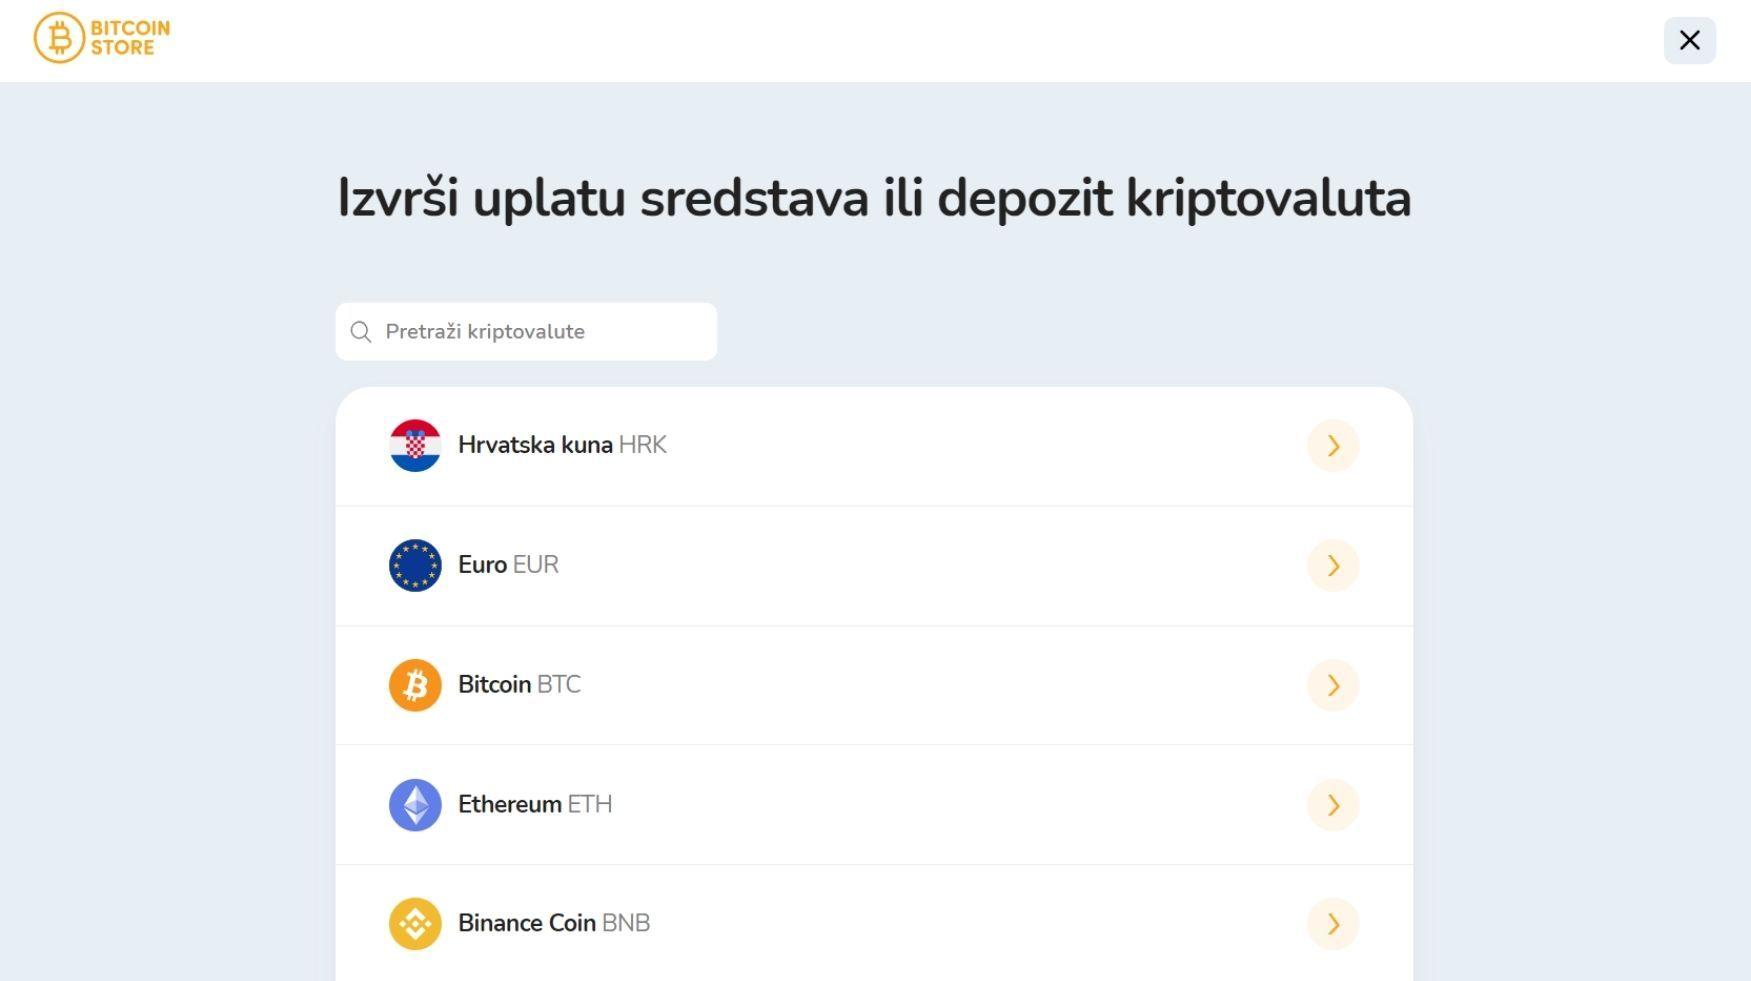 Prozor za odabir fiat valute za depozit na Bitcoin Store platformi.